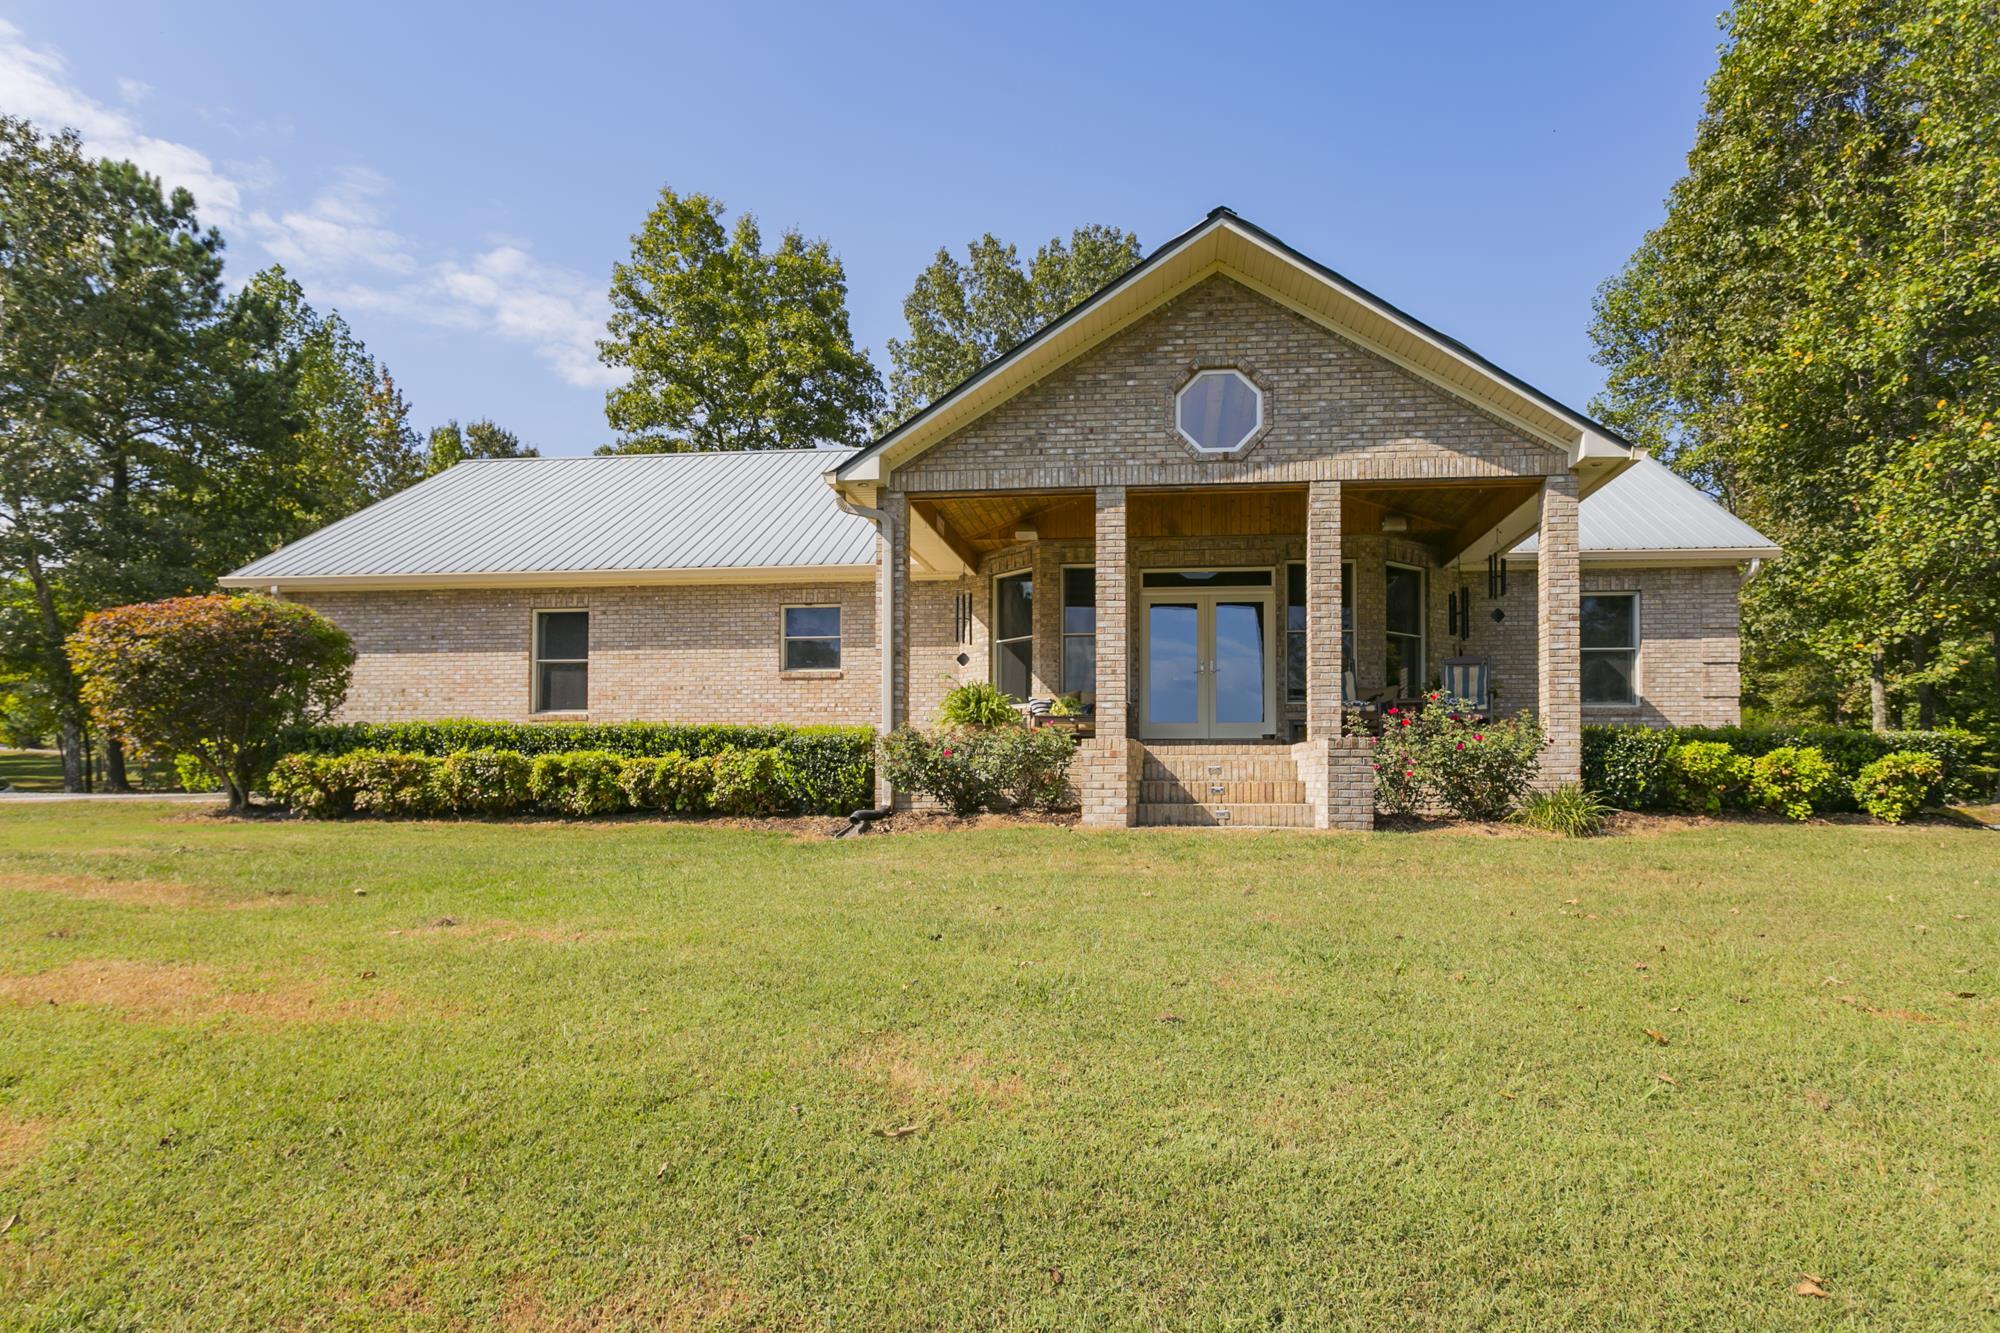 4400 Jefferson Rd, Smithville, TN 37166 - Smithville, TN real estate listing